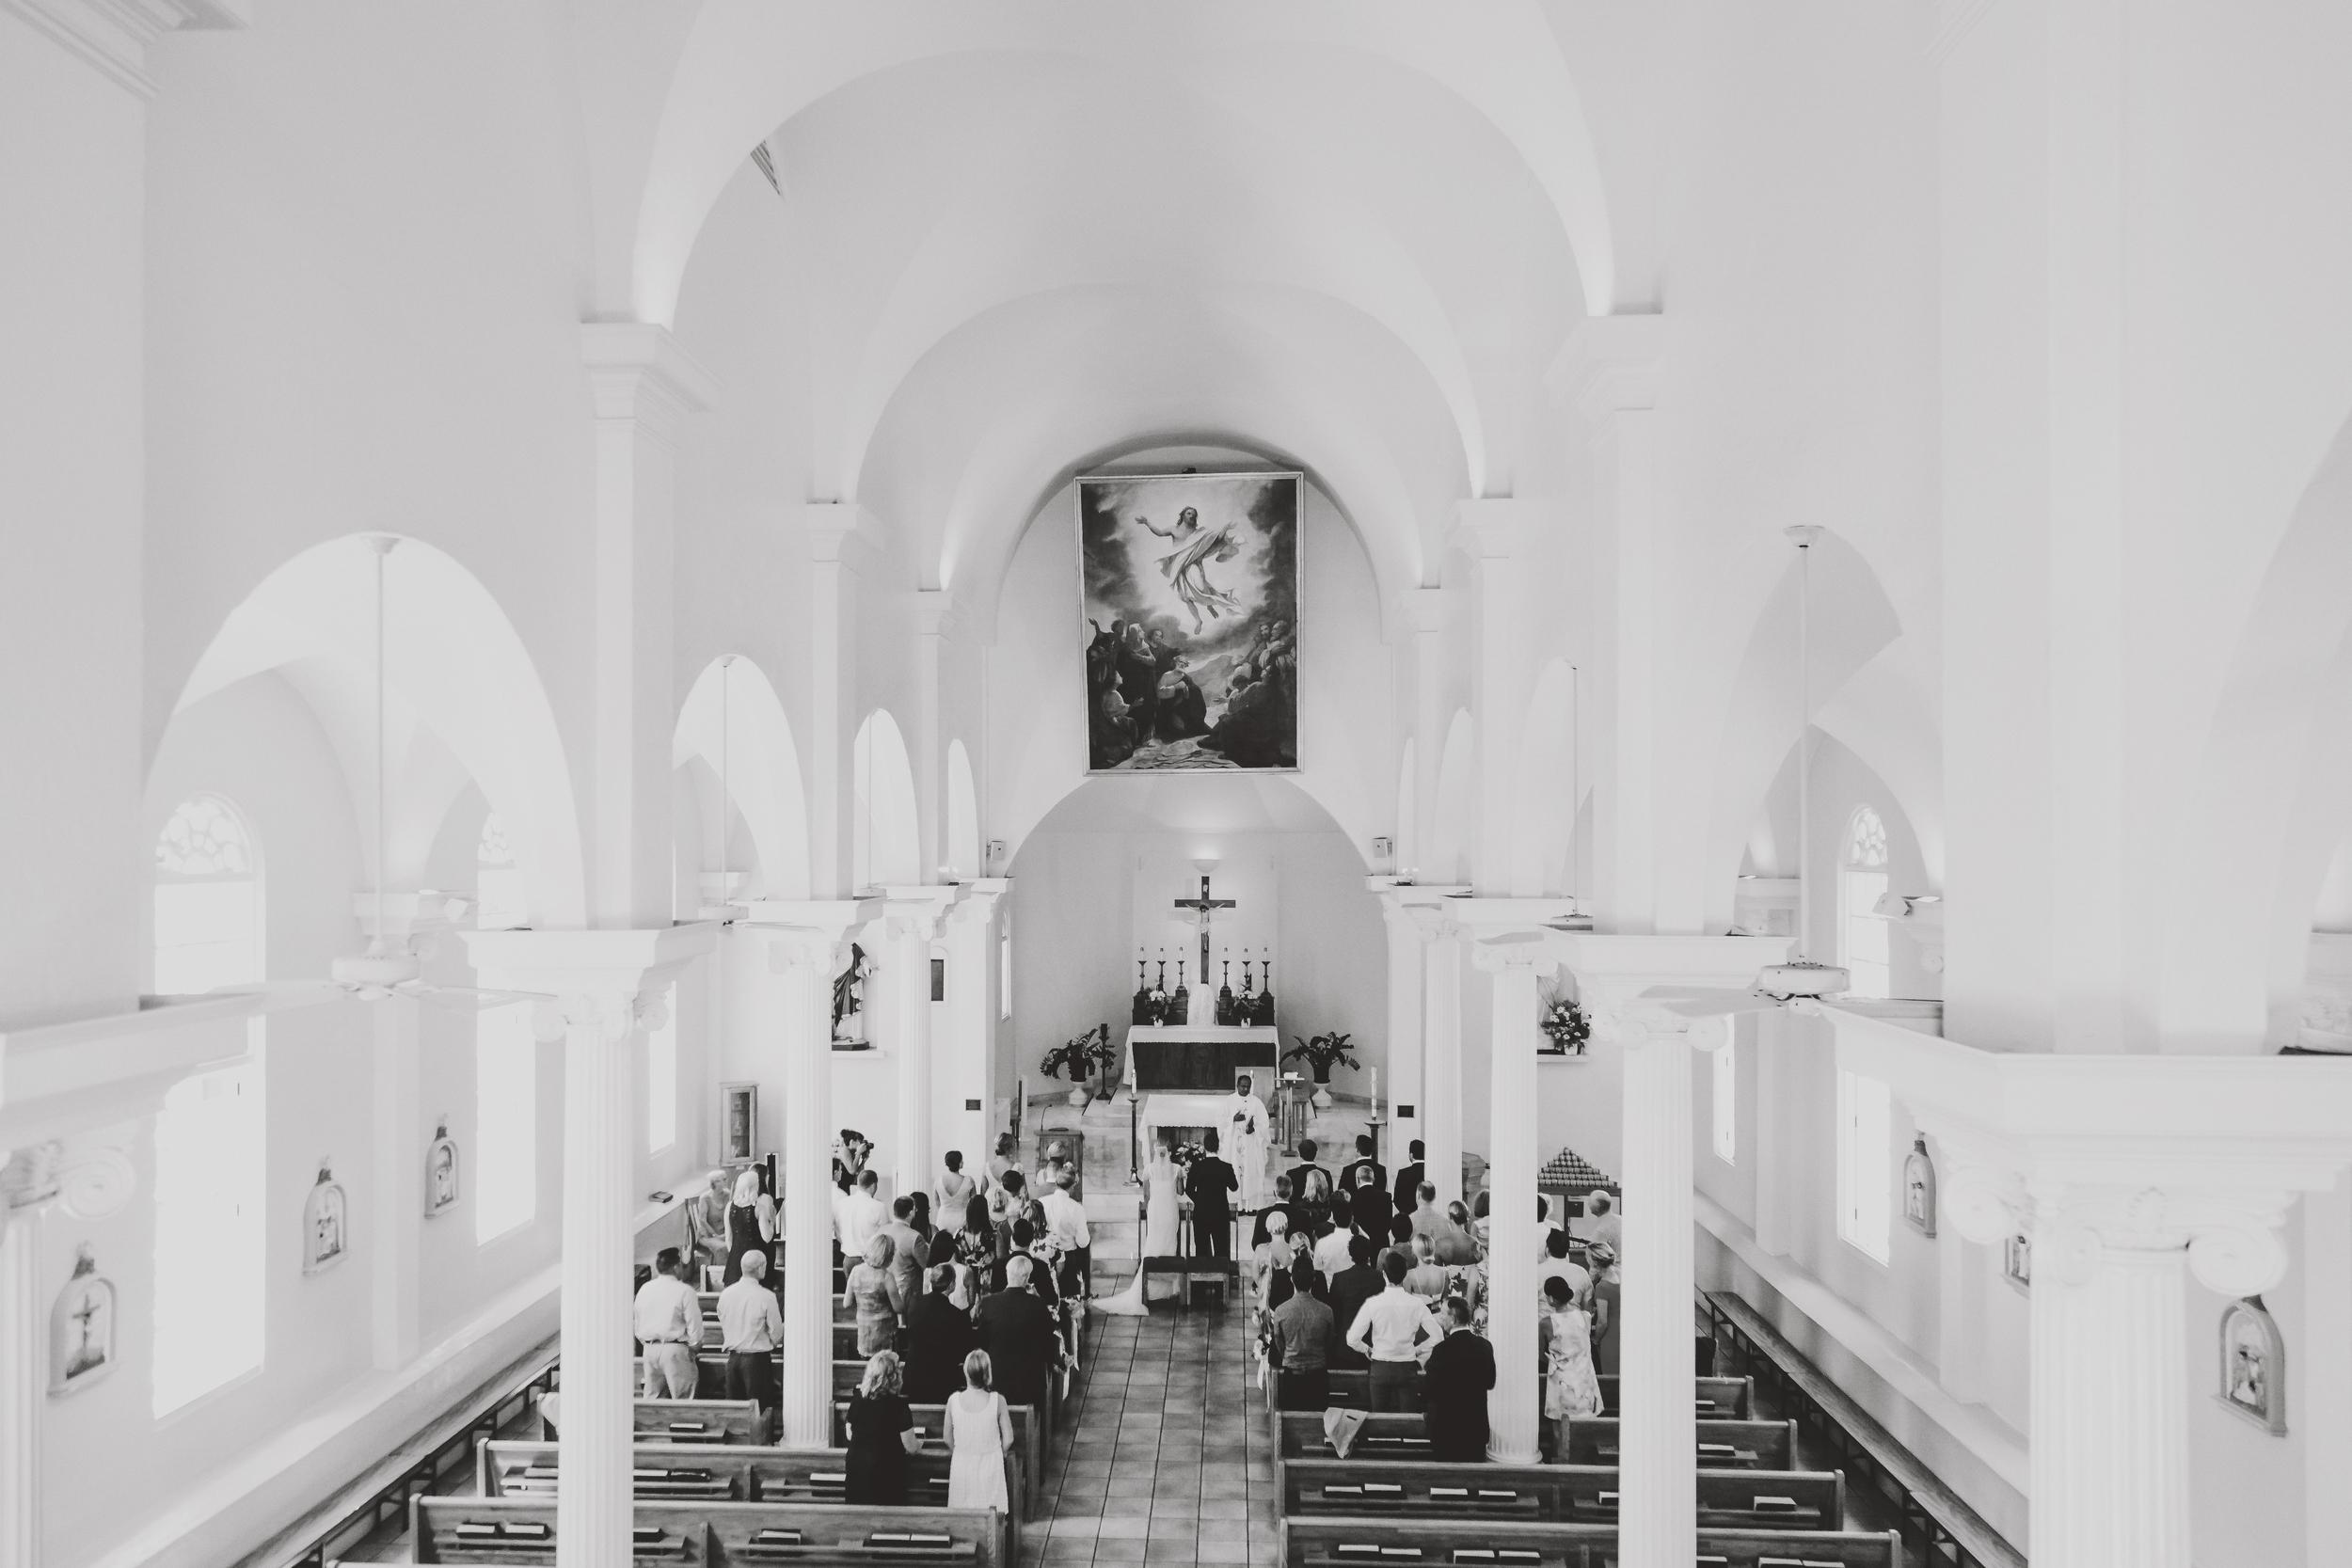 angie-diaz-photography-maui-wedding-mel-matt-31.jpeg